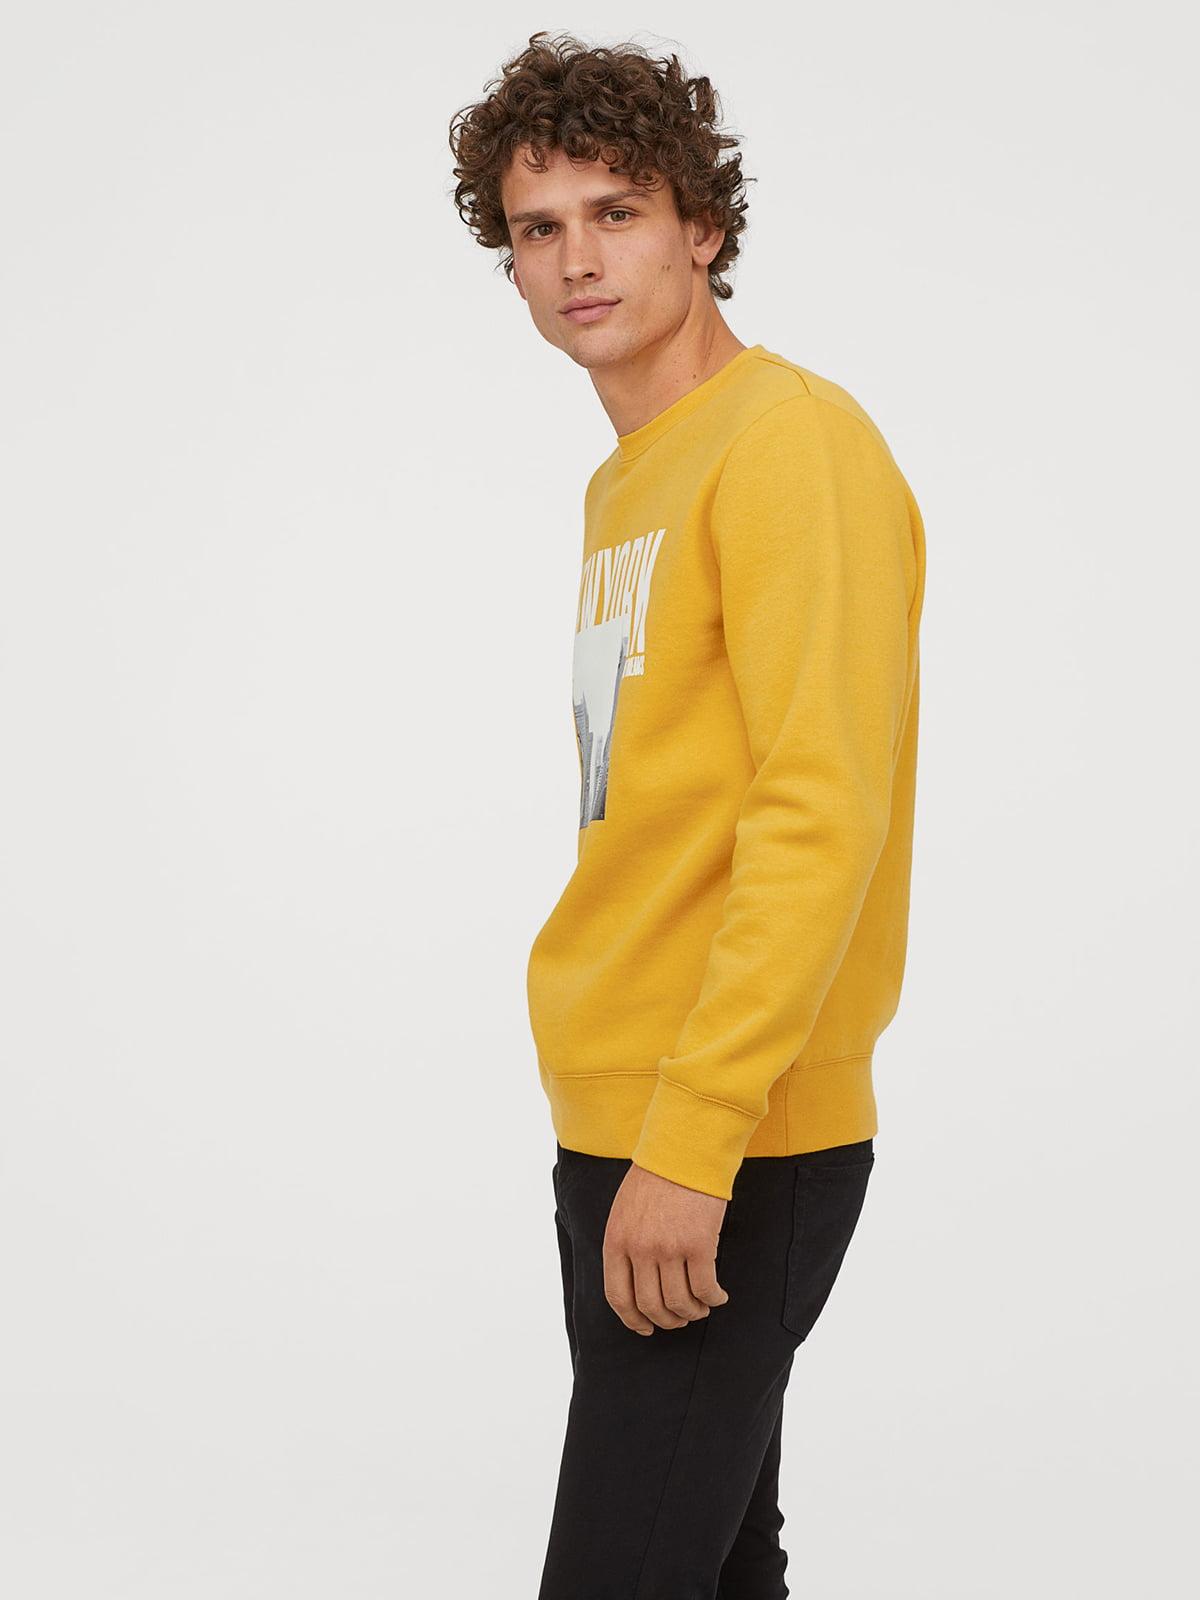 Свитшот желтый с принтом | 5046182